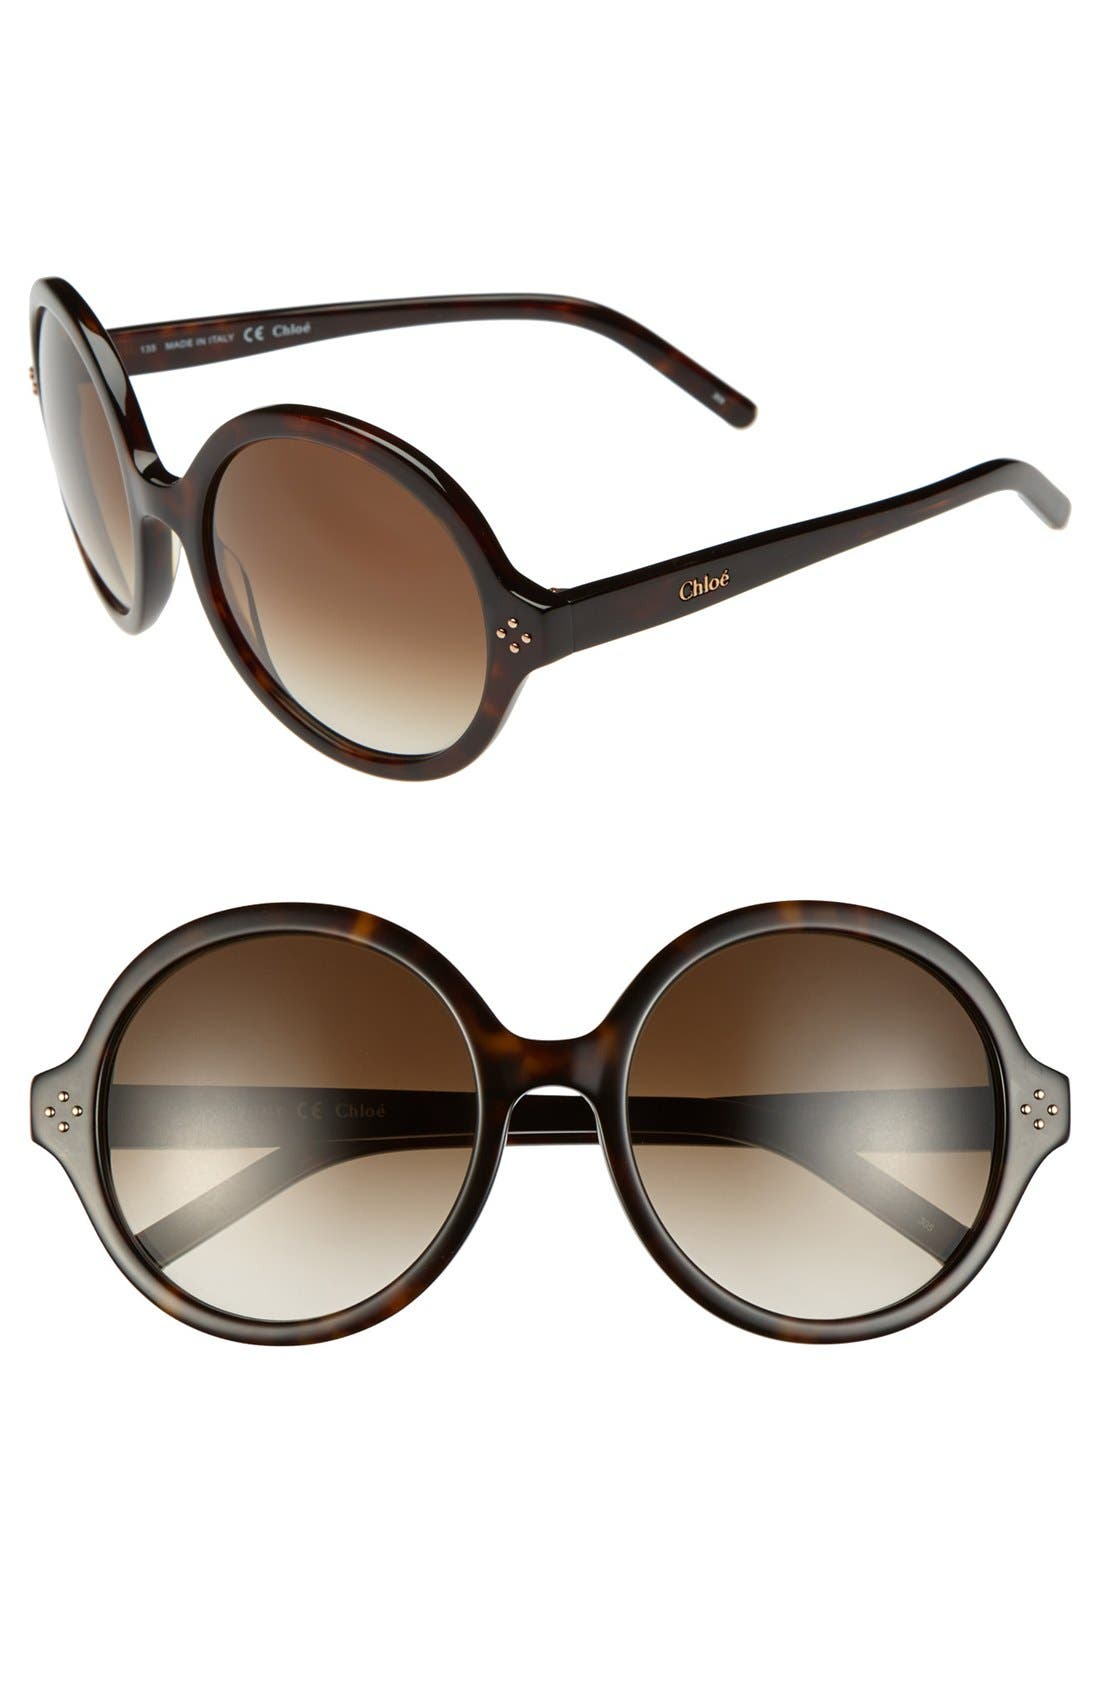 Main Image - Chloé 'Boxwood' 55mm Sunglasses